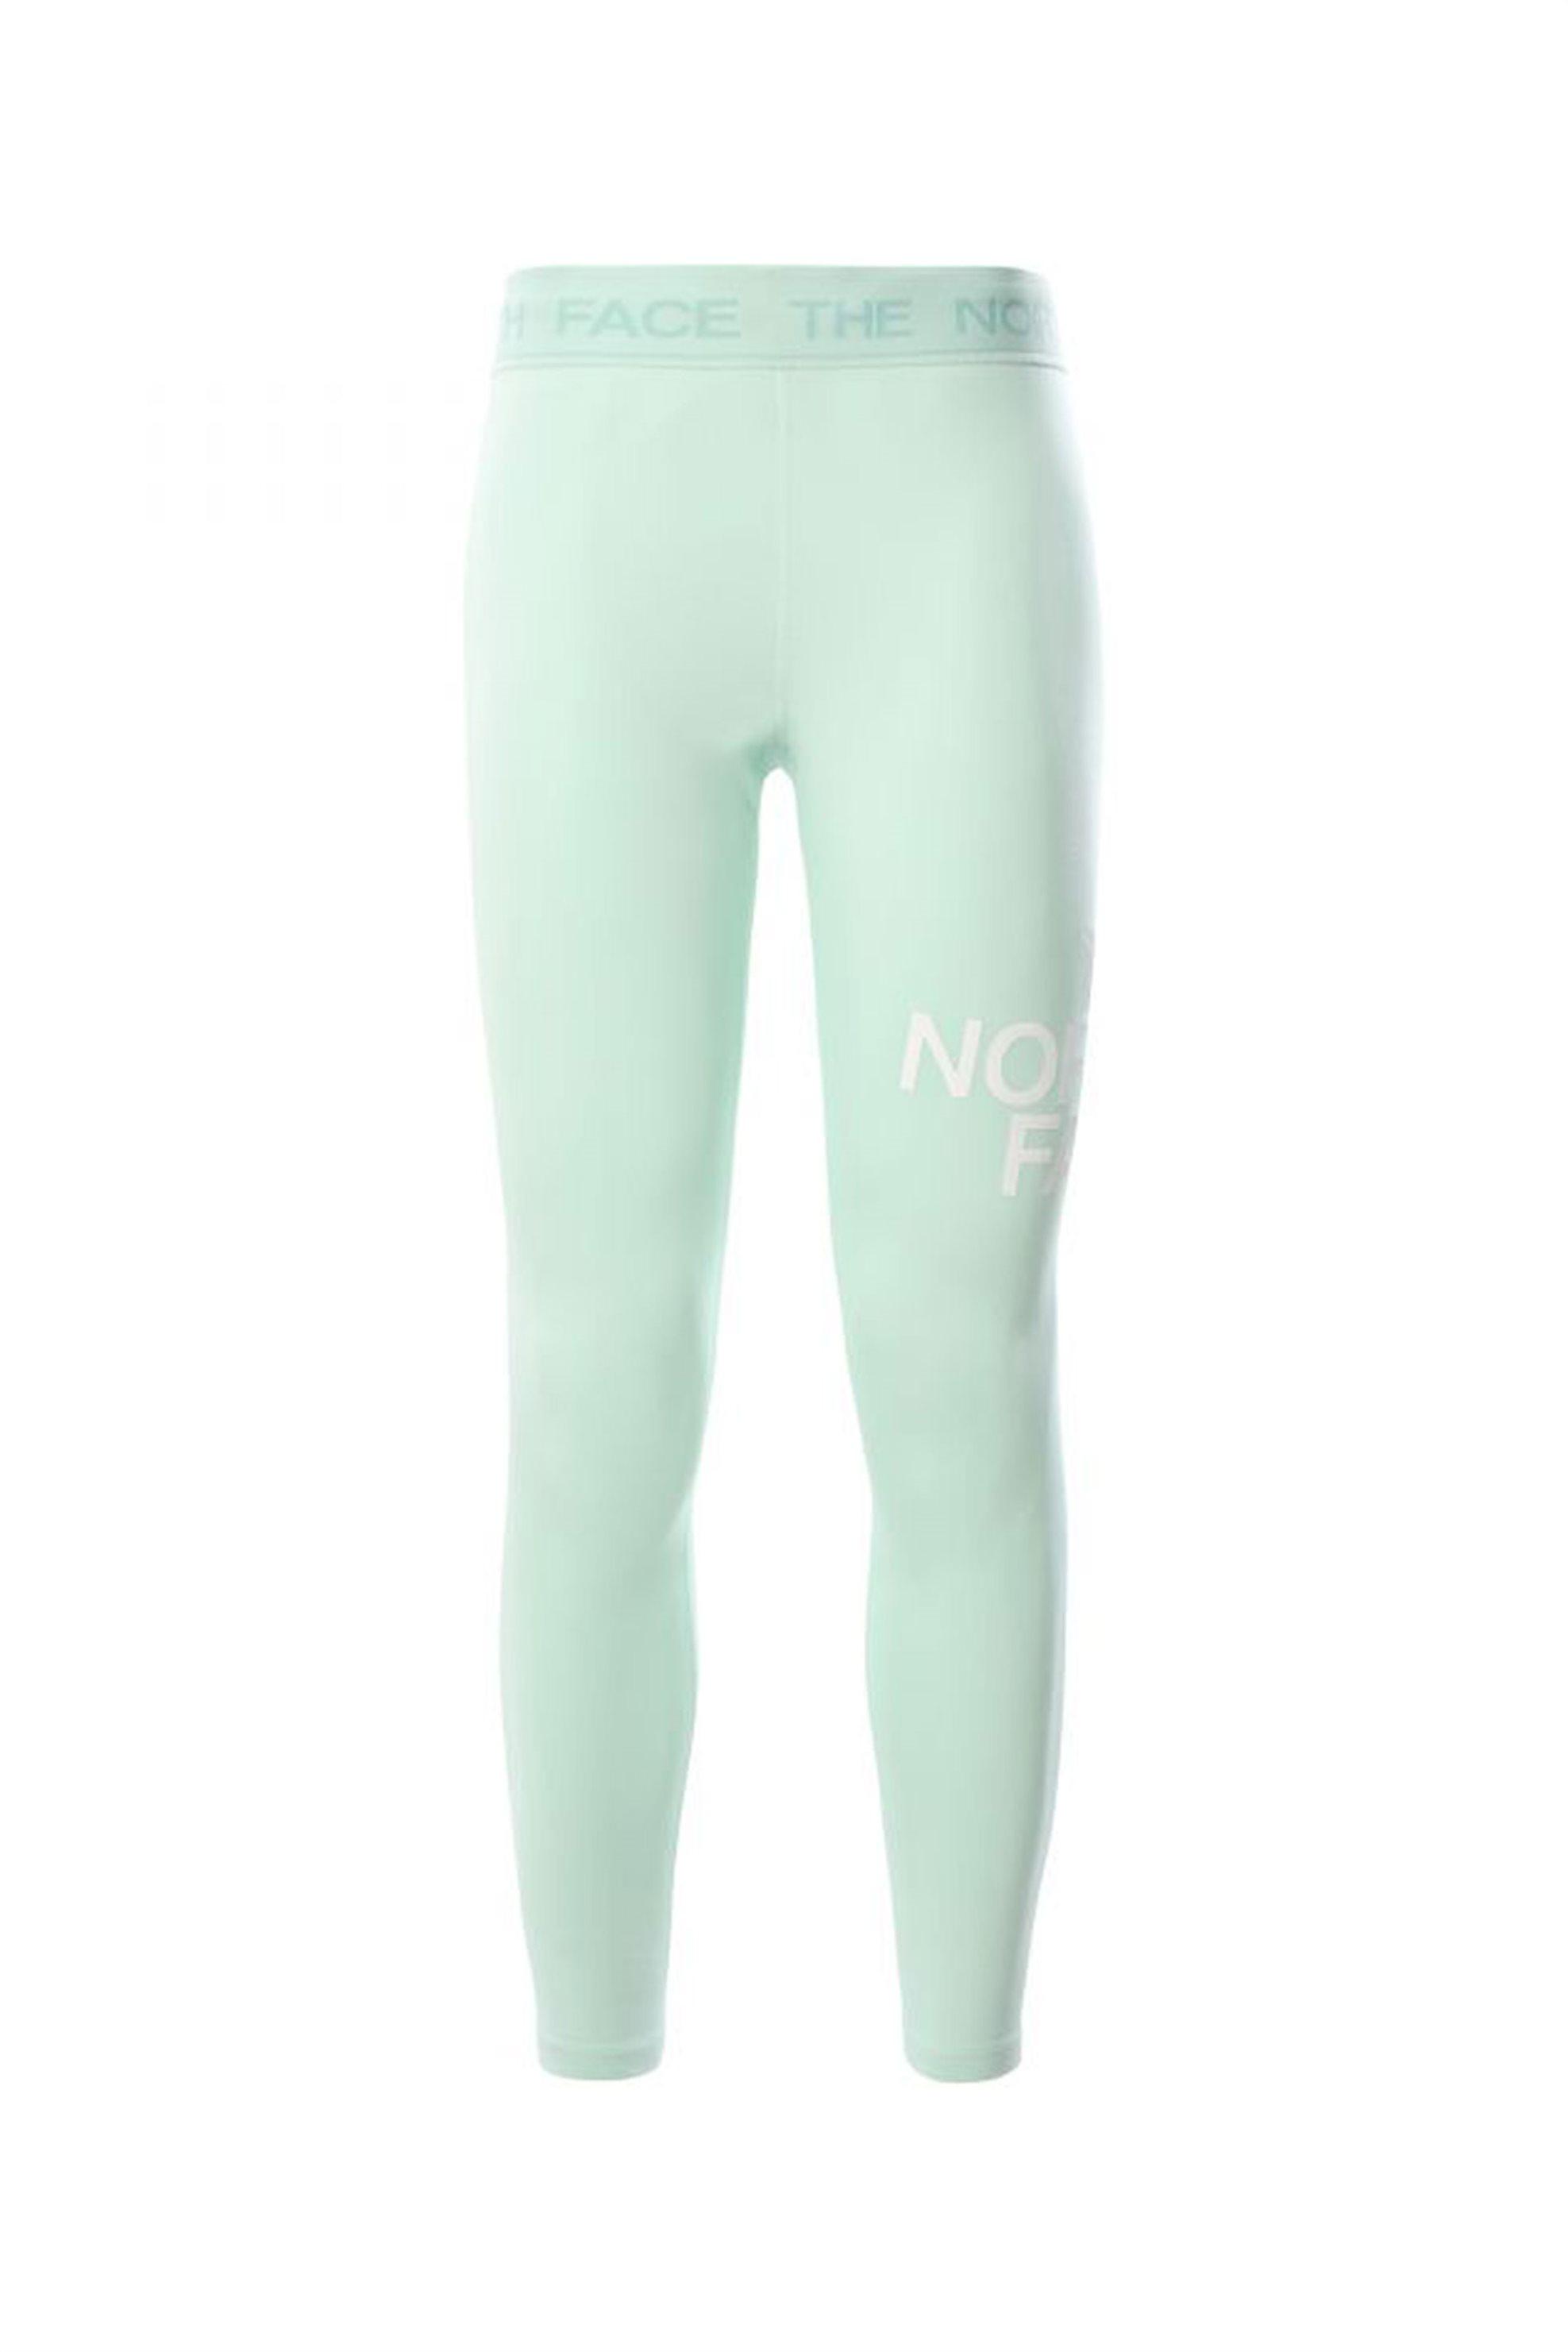 The North Face γυναικείο αθλητικό κολάν ''Flex'' - NF0A3YV9WC71 - Βεραμάν